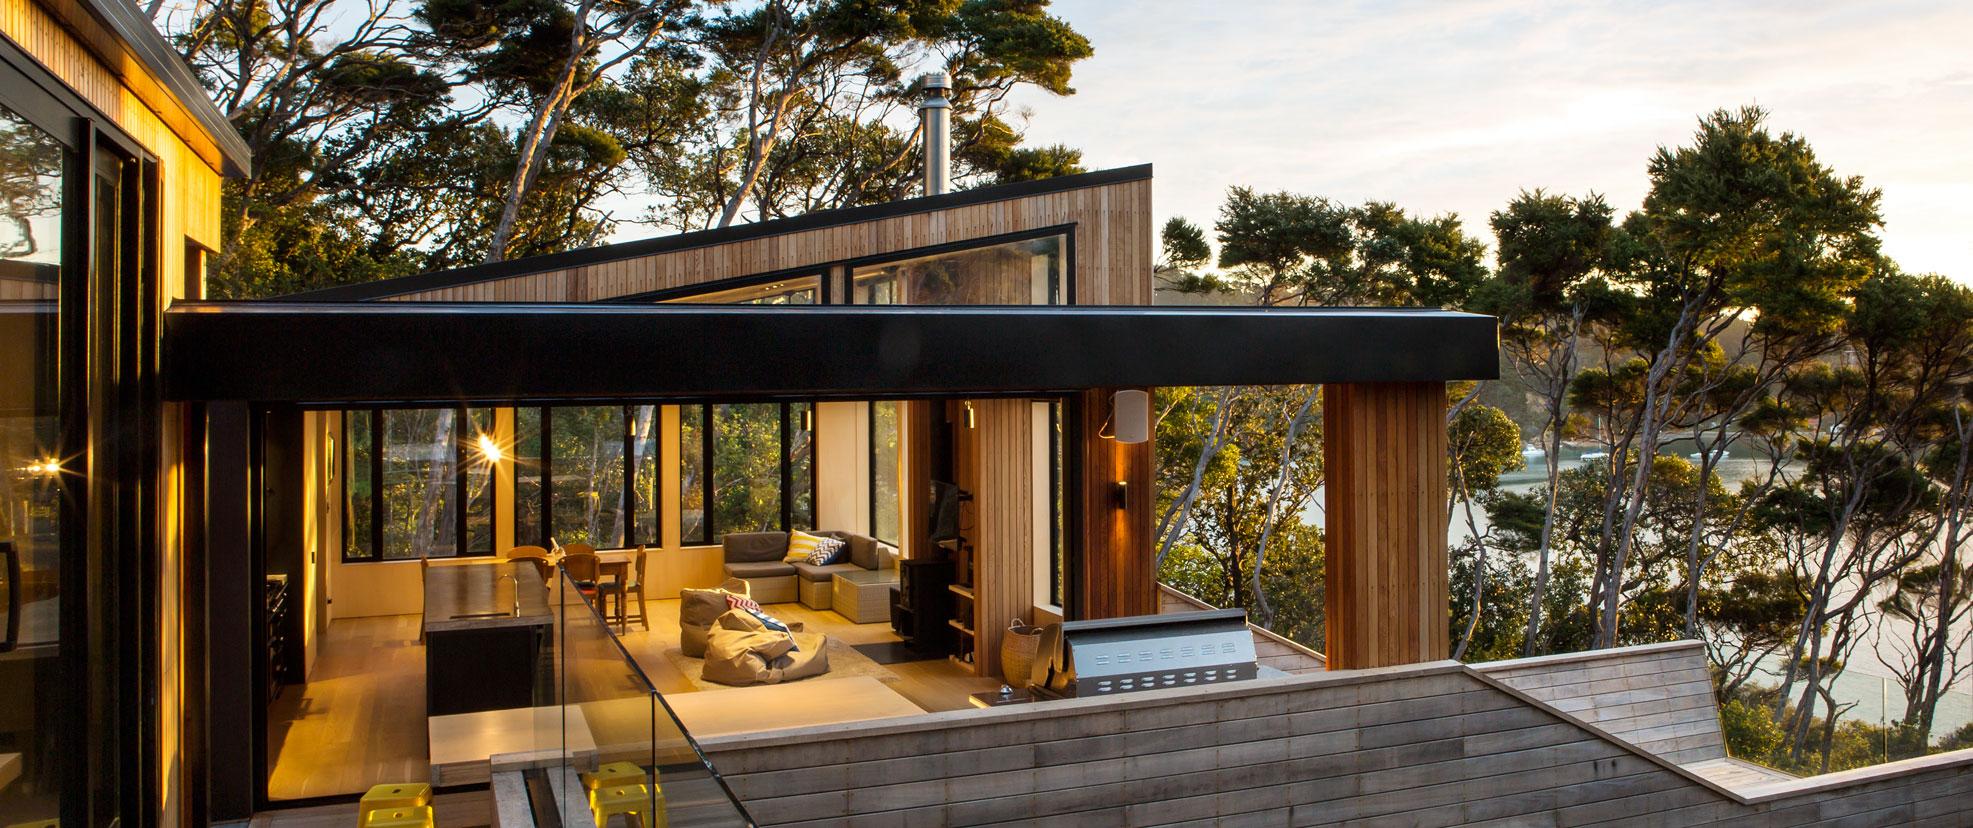 Kawau House; Architect: Tim Dorrington; Photographer: Emma-Jane Hertherington